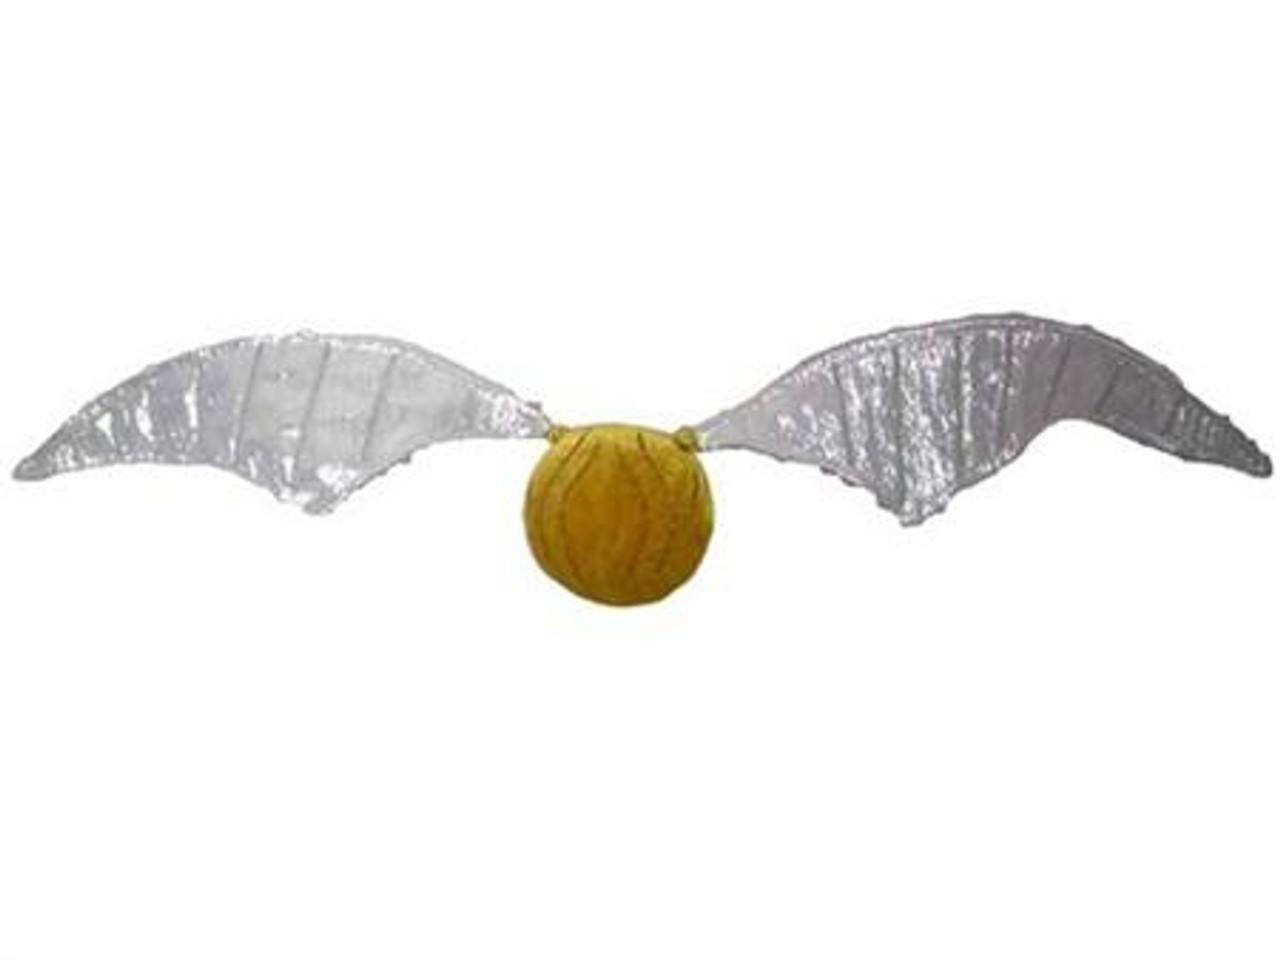 NECA Harry Potter Golden Snitch 21-Inch Plush